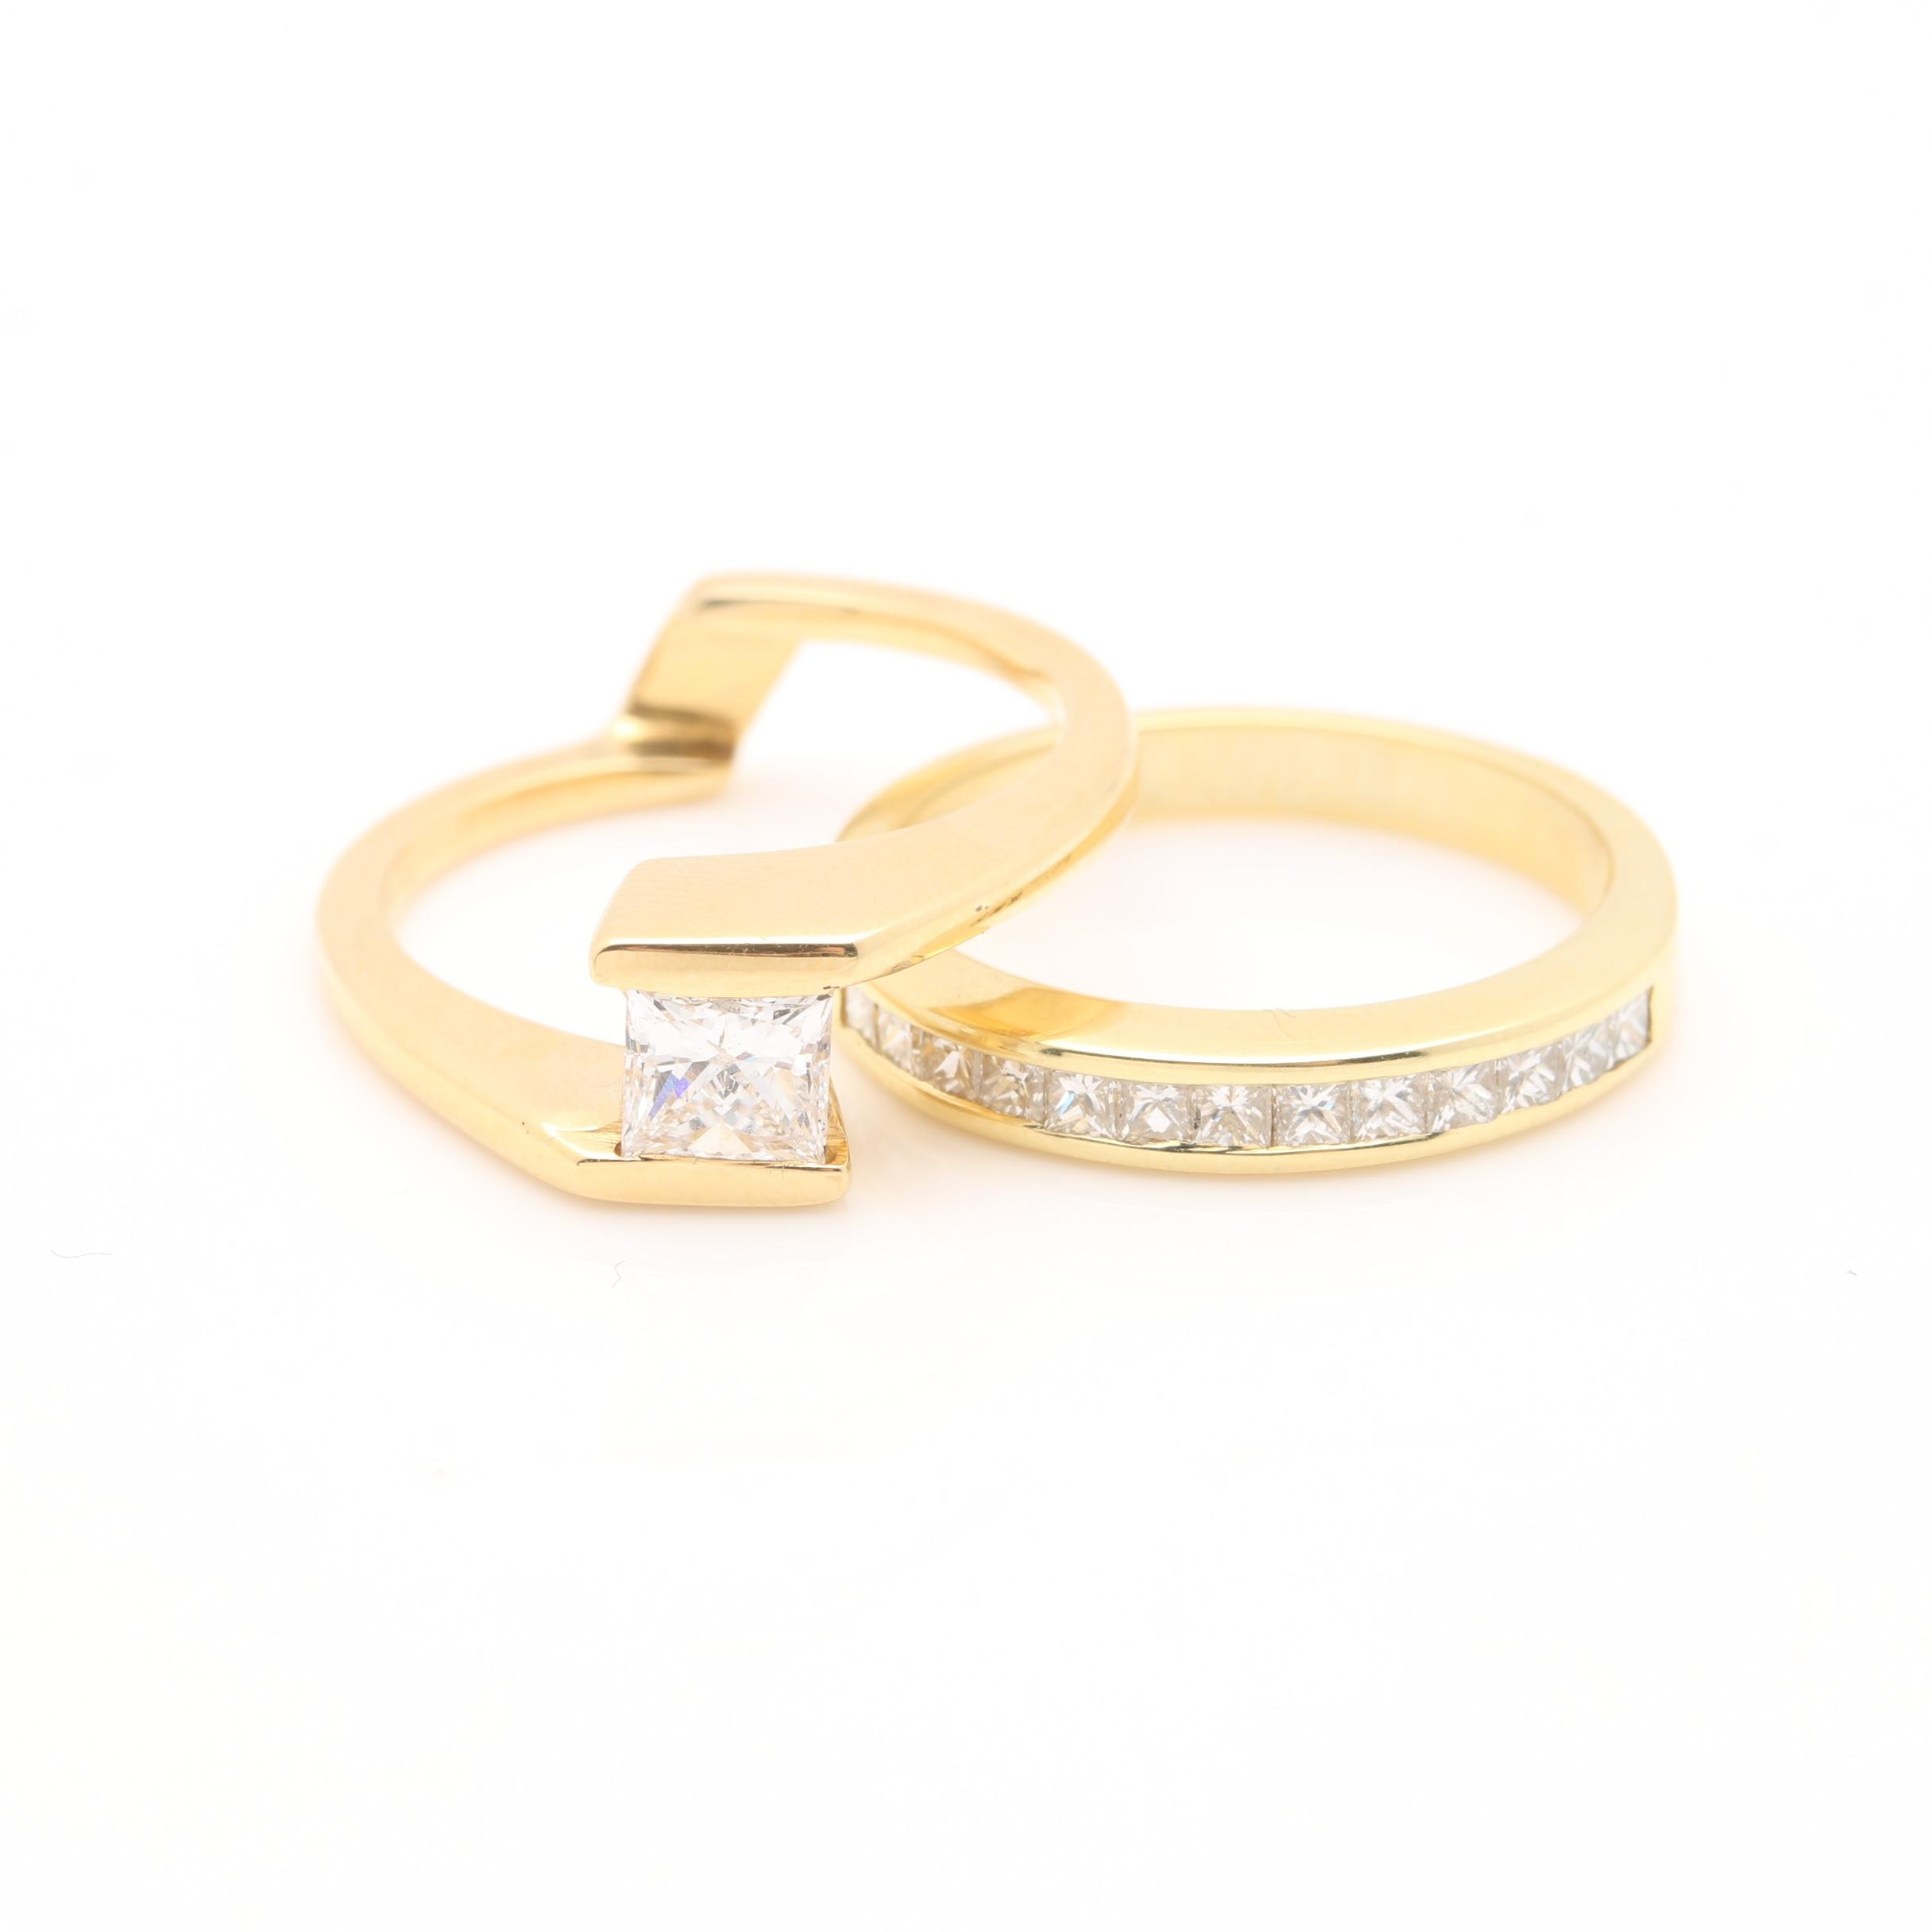 18K Yellow Gold Diamond Ring Set